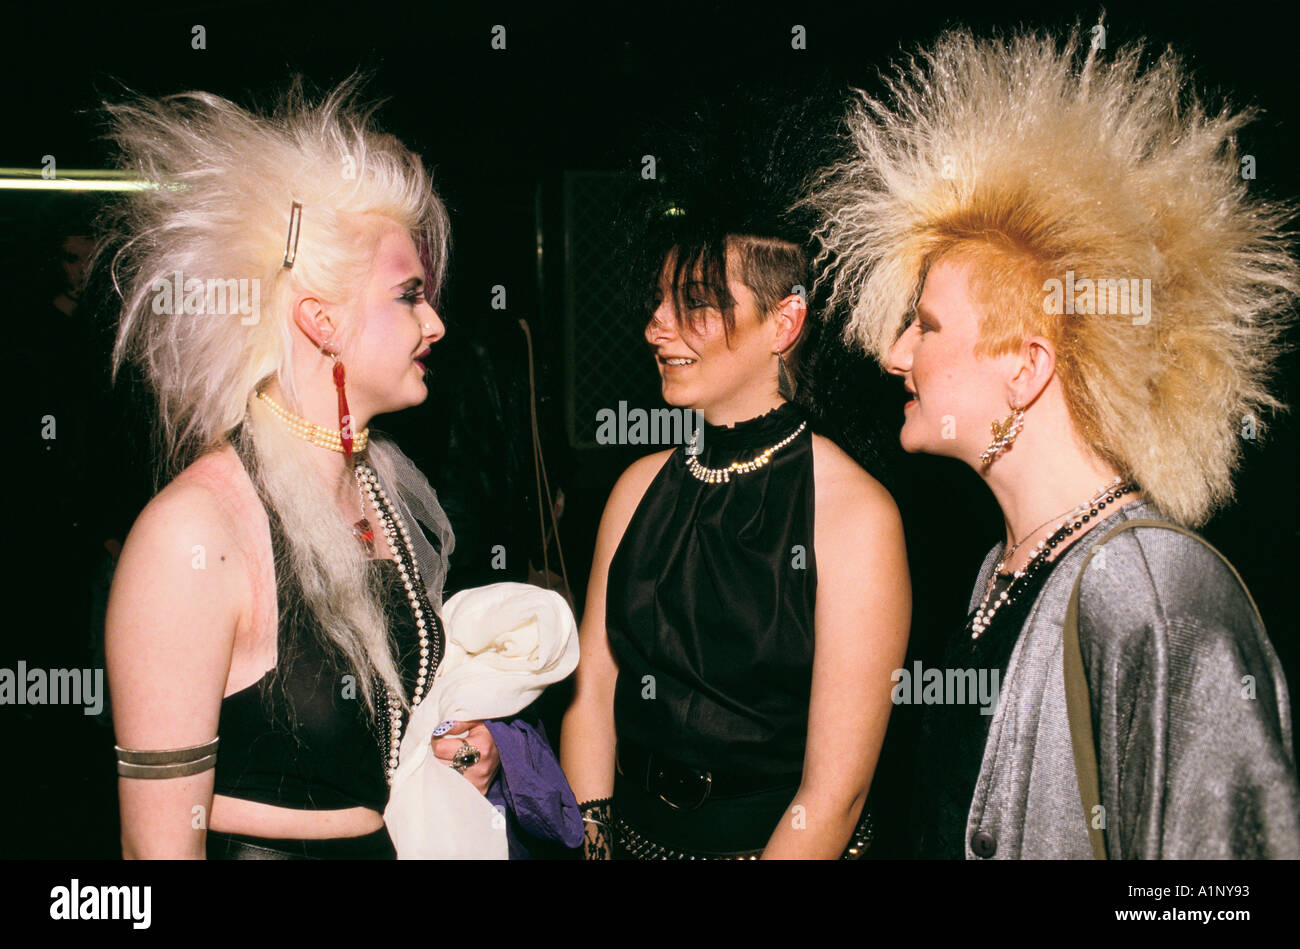 New Romantics youth cult  followers of pop band Sigue Sigue  Sputnik 1980s 80s UK HOMER SYKES - Stock Image